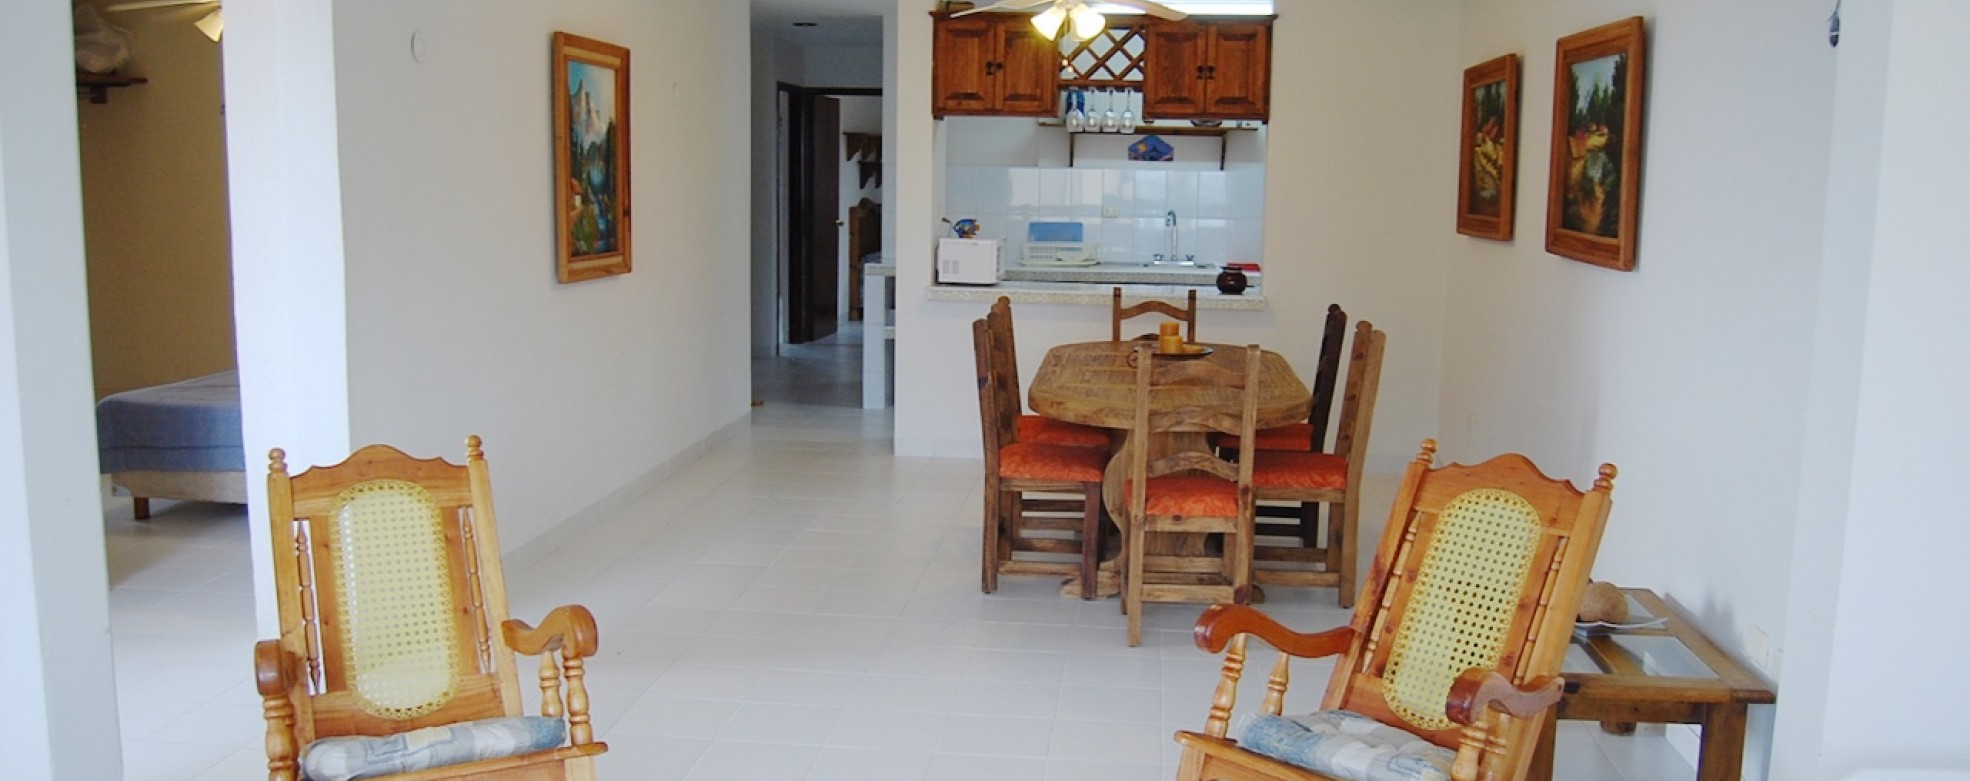 CORAL BEACH CHICXULUB YUCATAN   Yucatan Real Estate   We